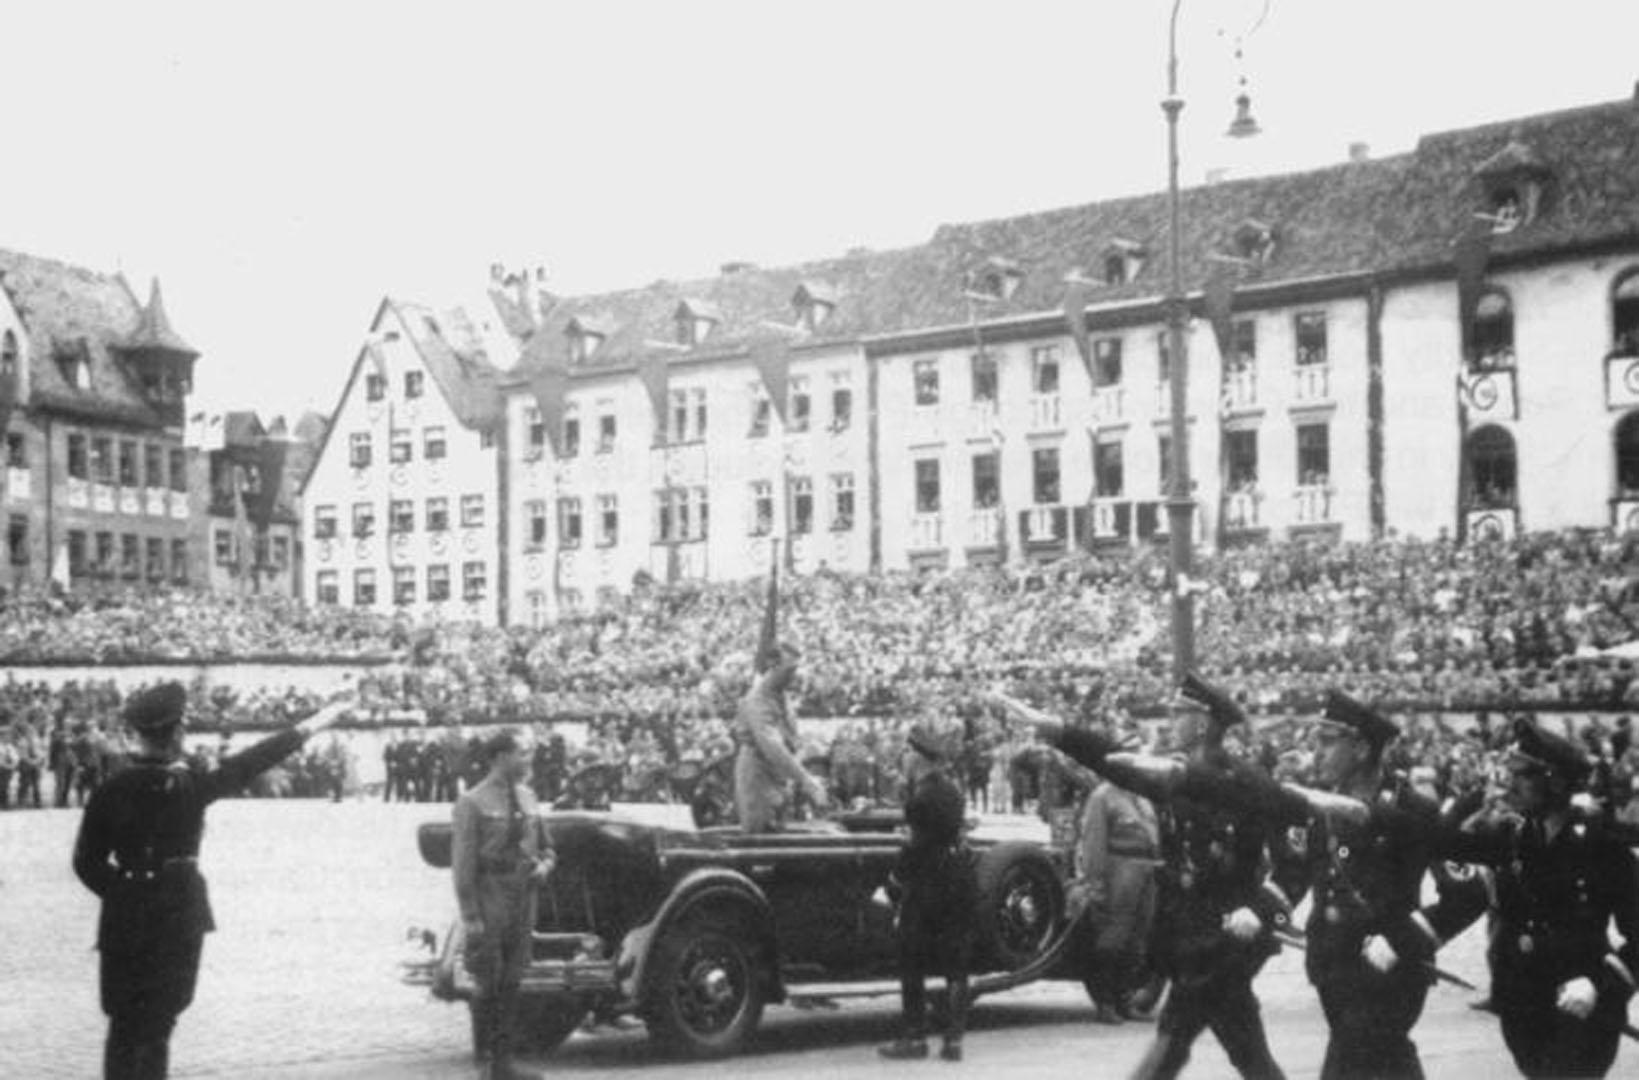 Hitler At Rally In Bavaria